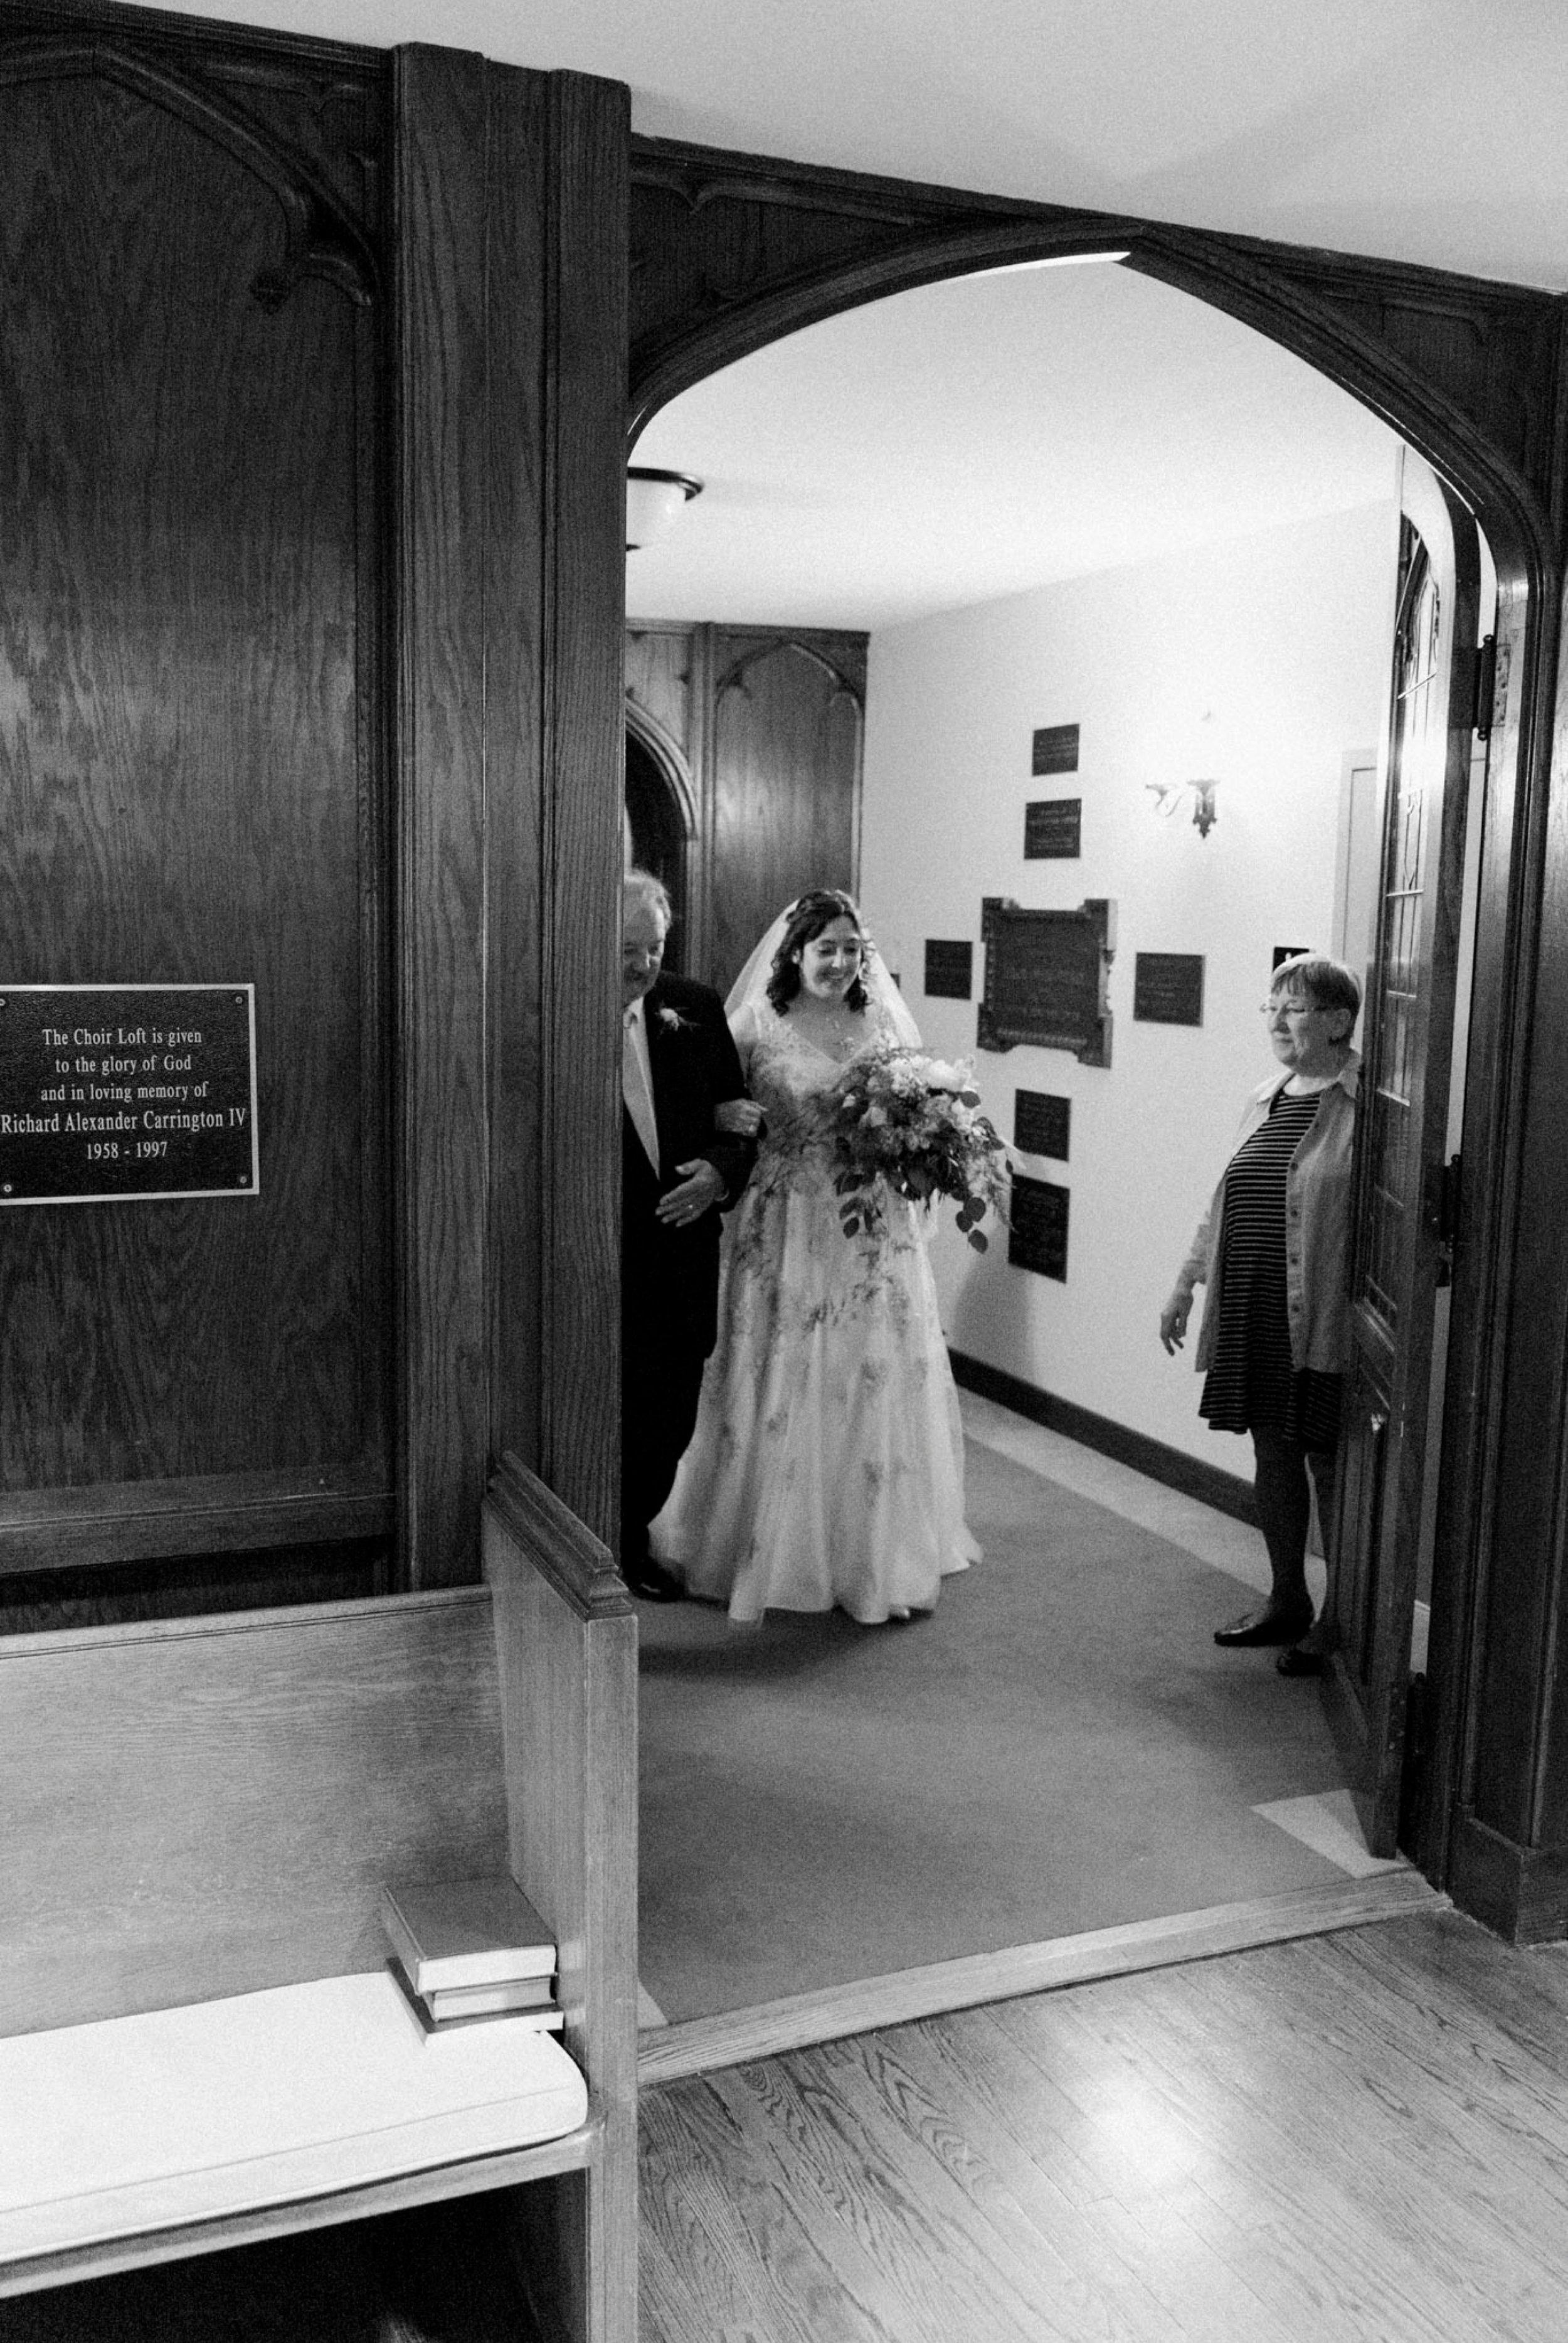 TheVirginianHotel_LynchburgVA_TheVirginianHotelWedding_Virginiaweddingphotographer_Lynchburgvawedding 24.jpg